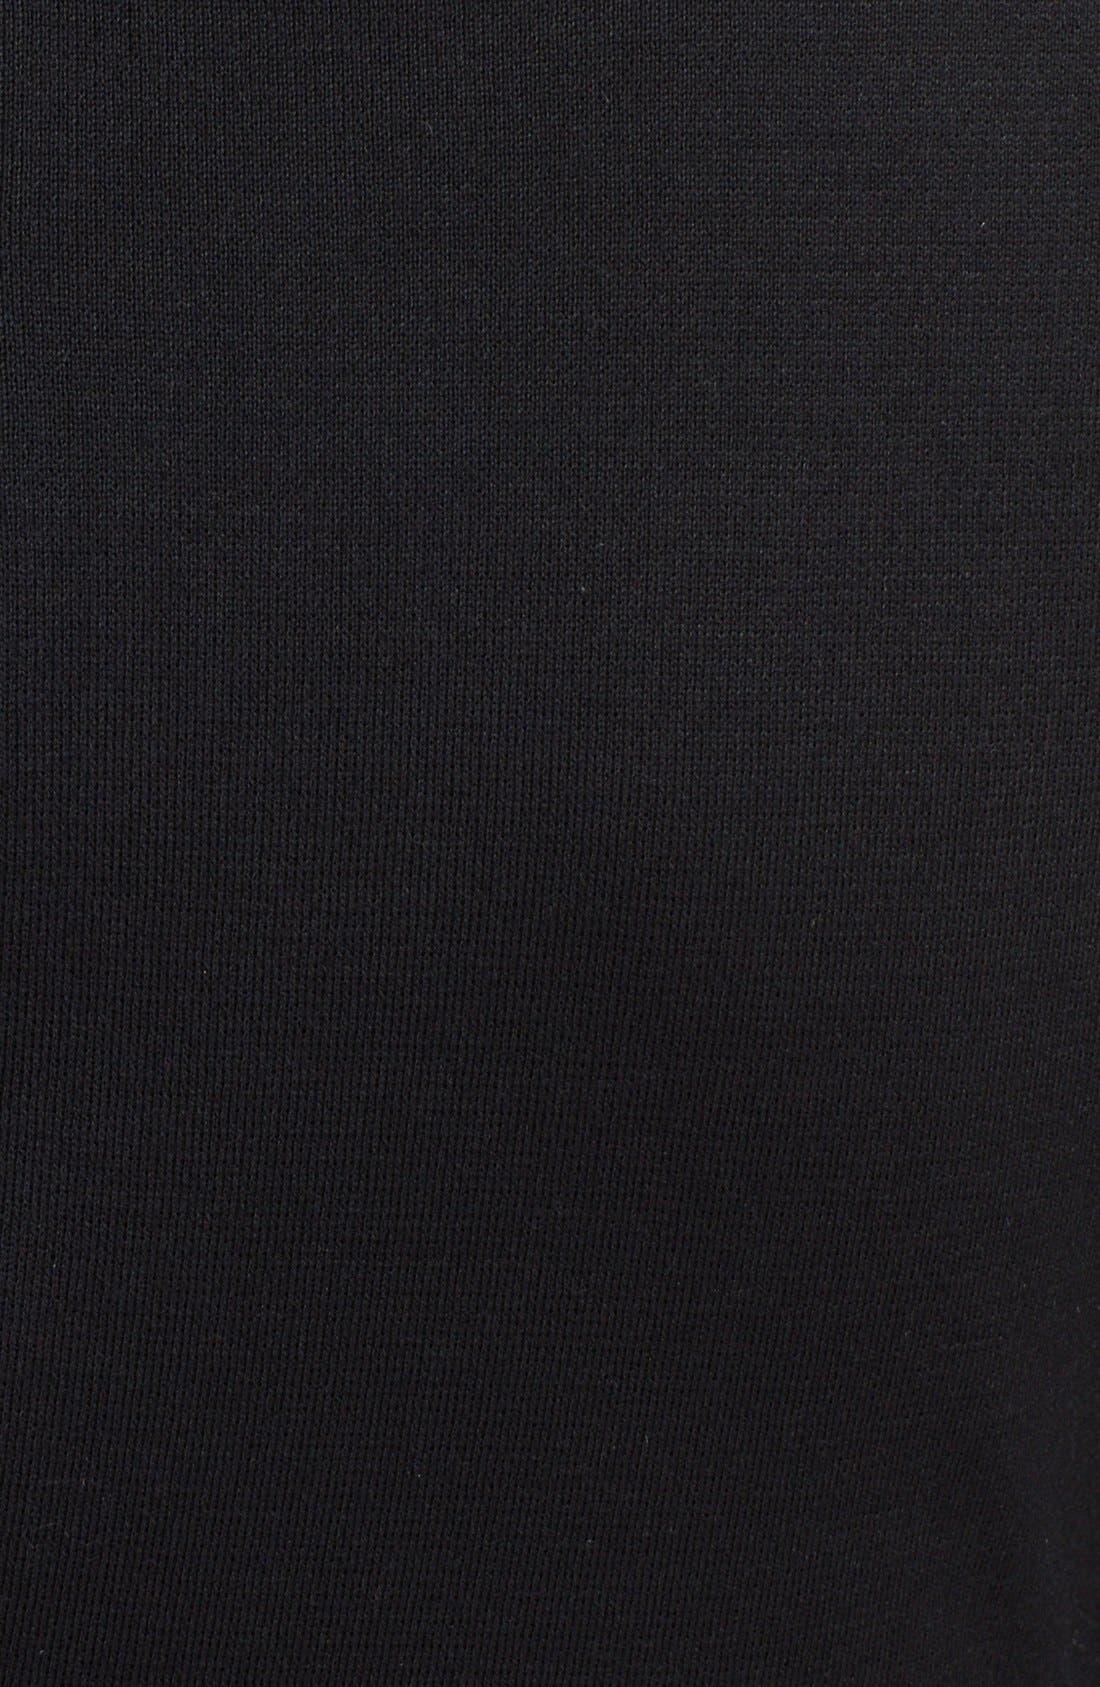 Alternate Image 3  - St. John Collection Bateau Neck Drape Front Milano Knit Dress